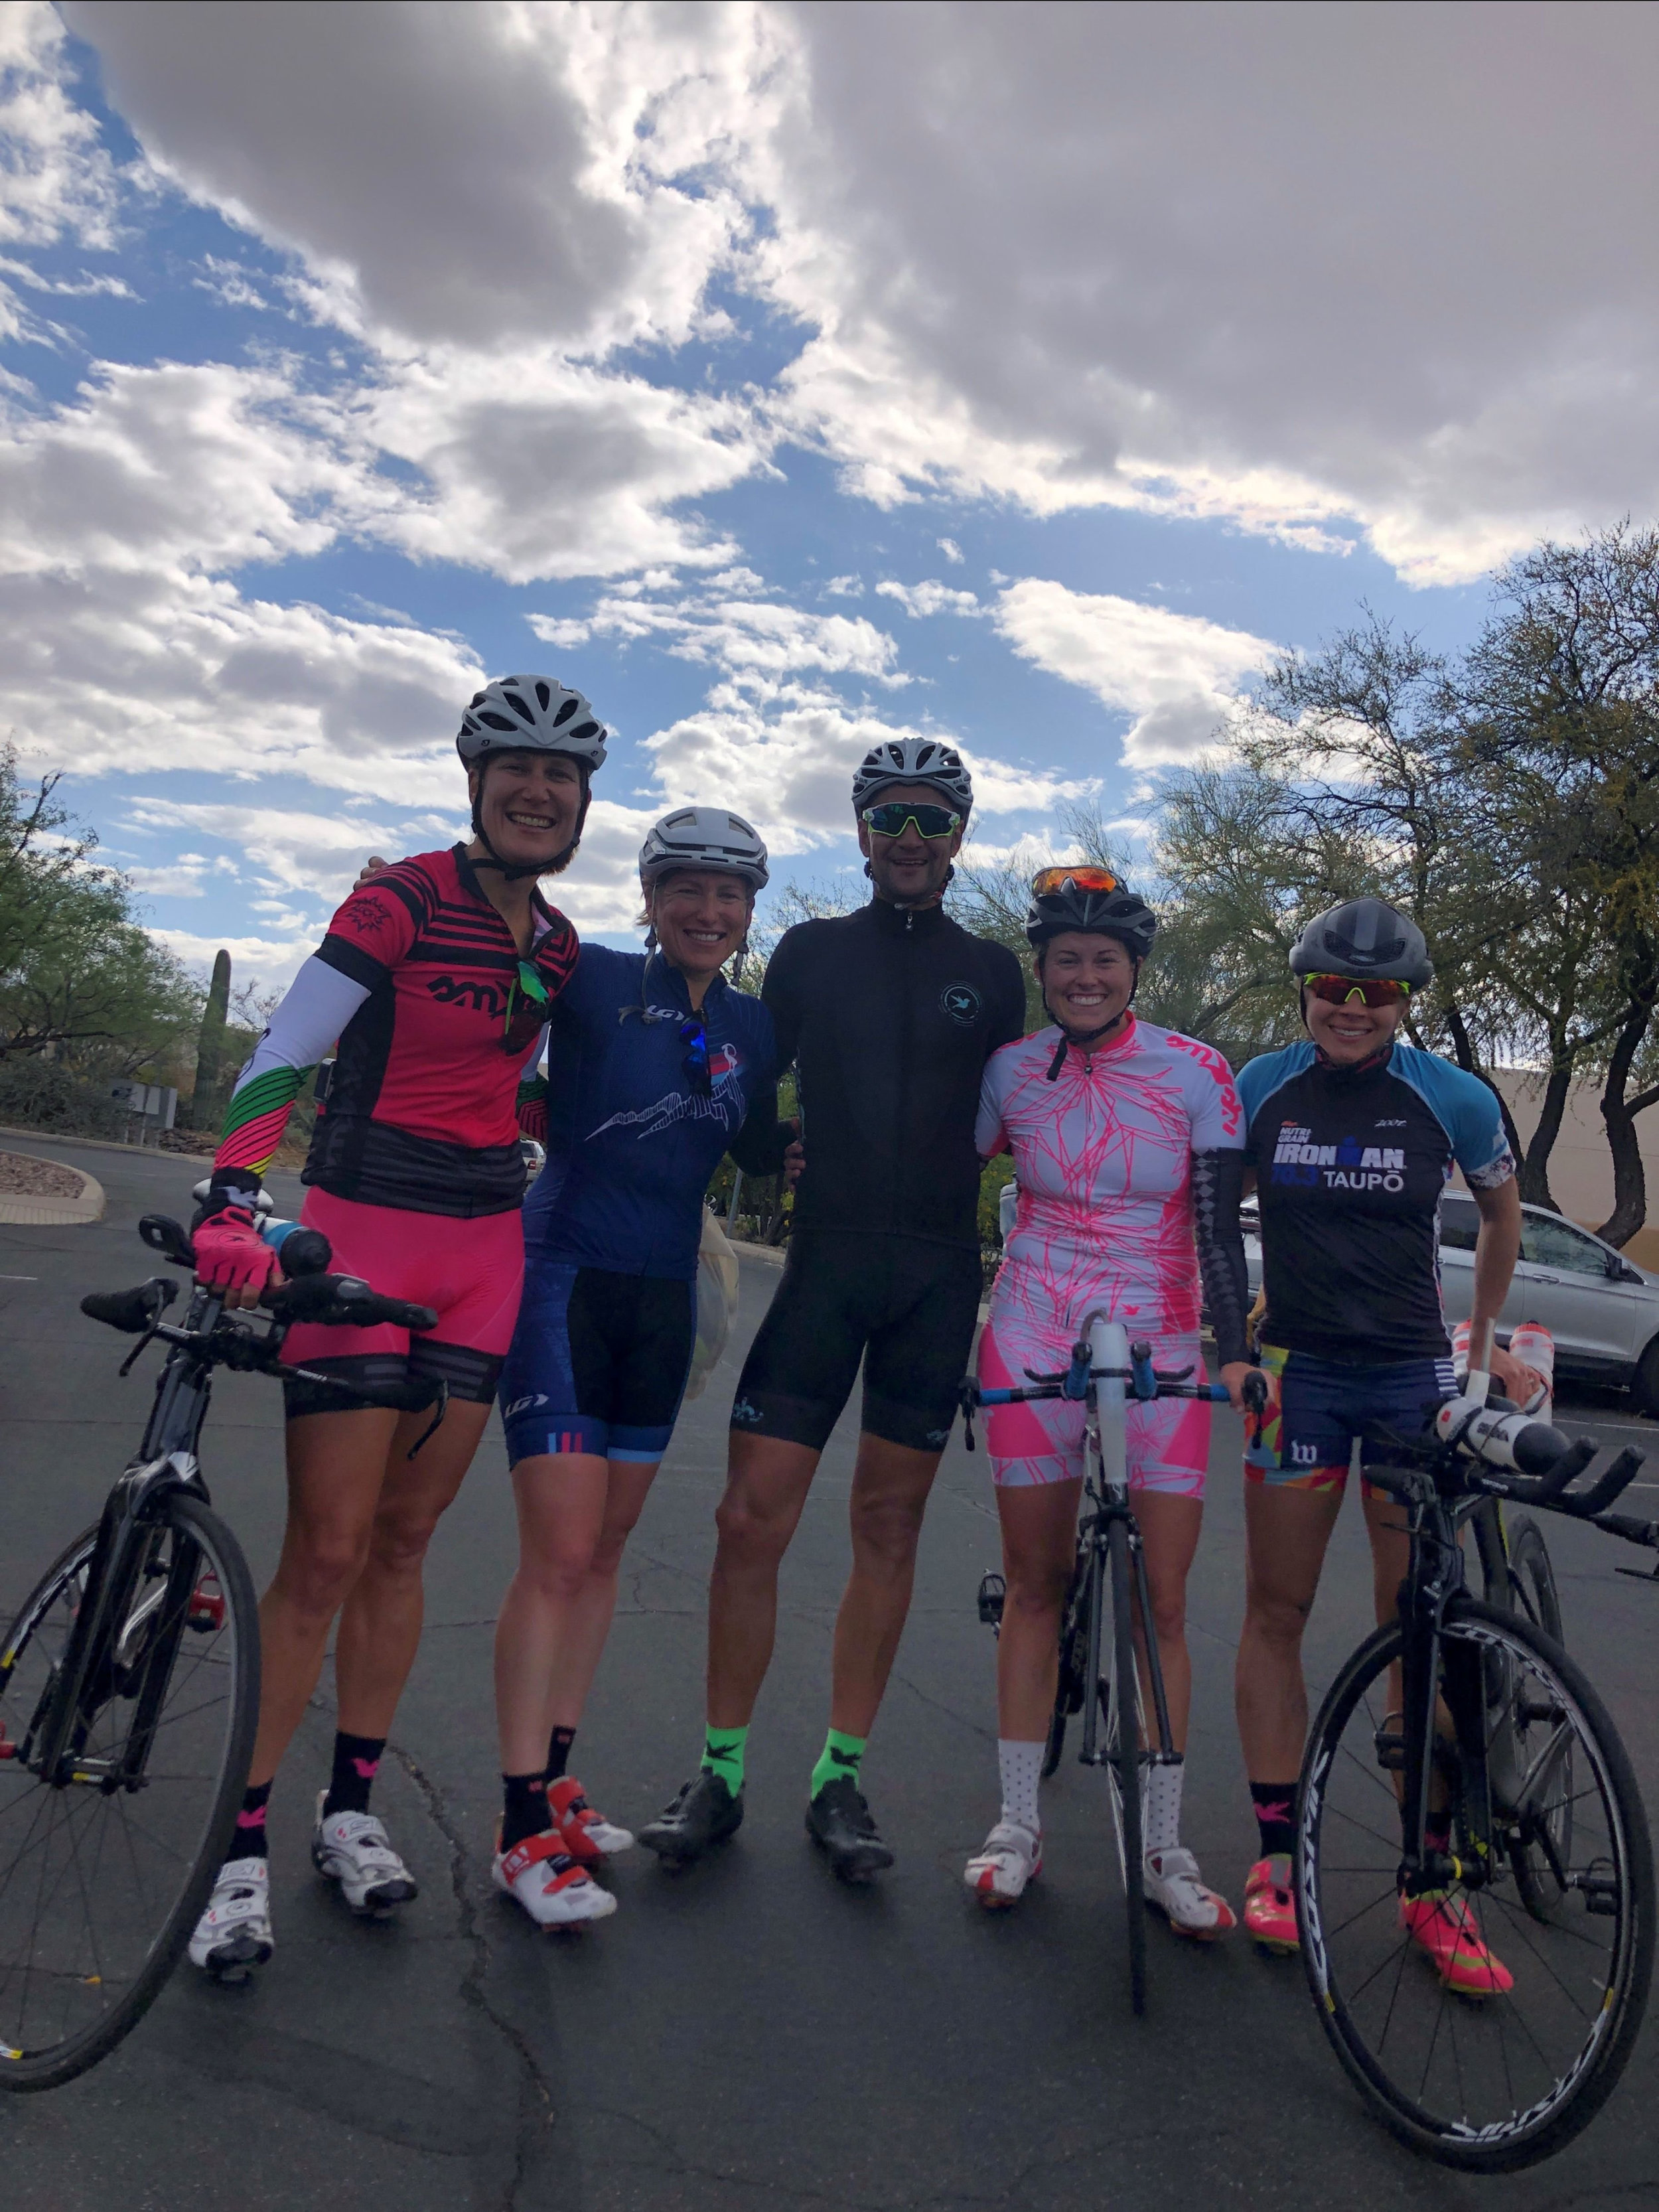 From left, Moi, Holly, Maik, Jess, and Alysha. Photo courtesy of Hillary Biscay.